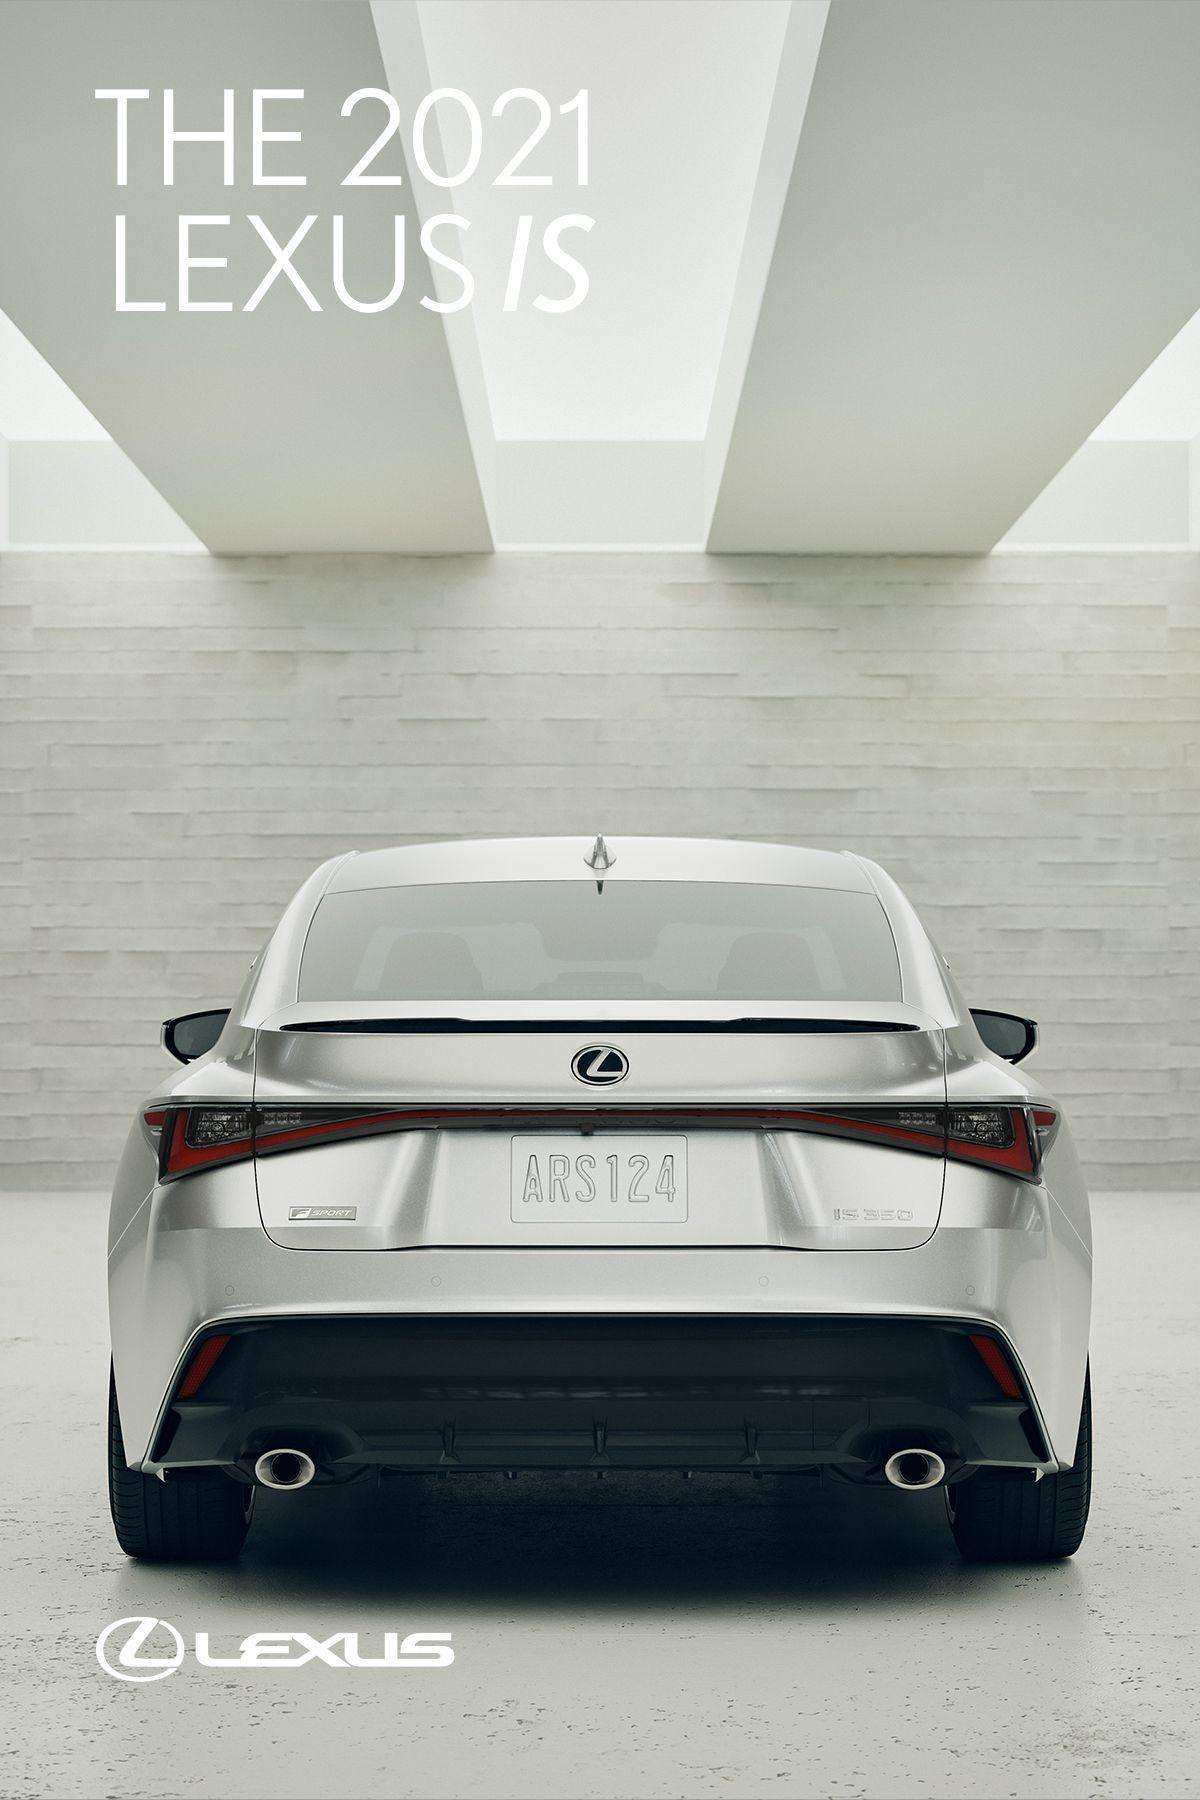 THE 2021 LEXUS IS in 2020 | Lexus, Lovely car, Cars trucks